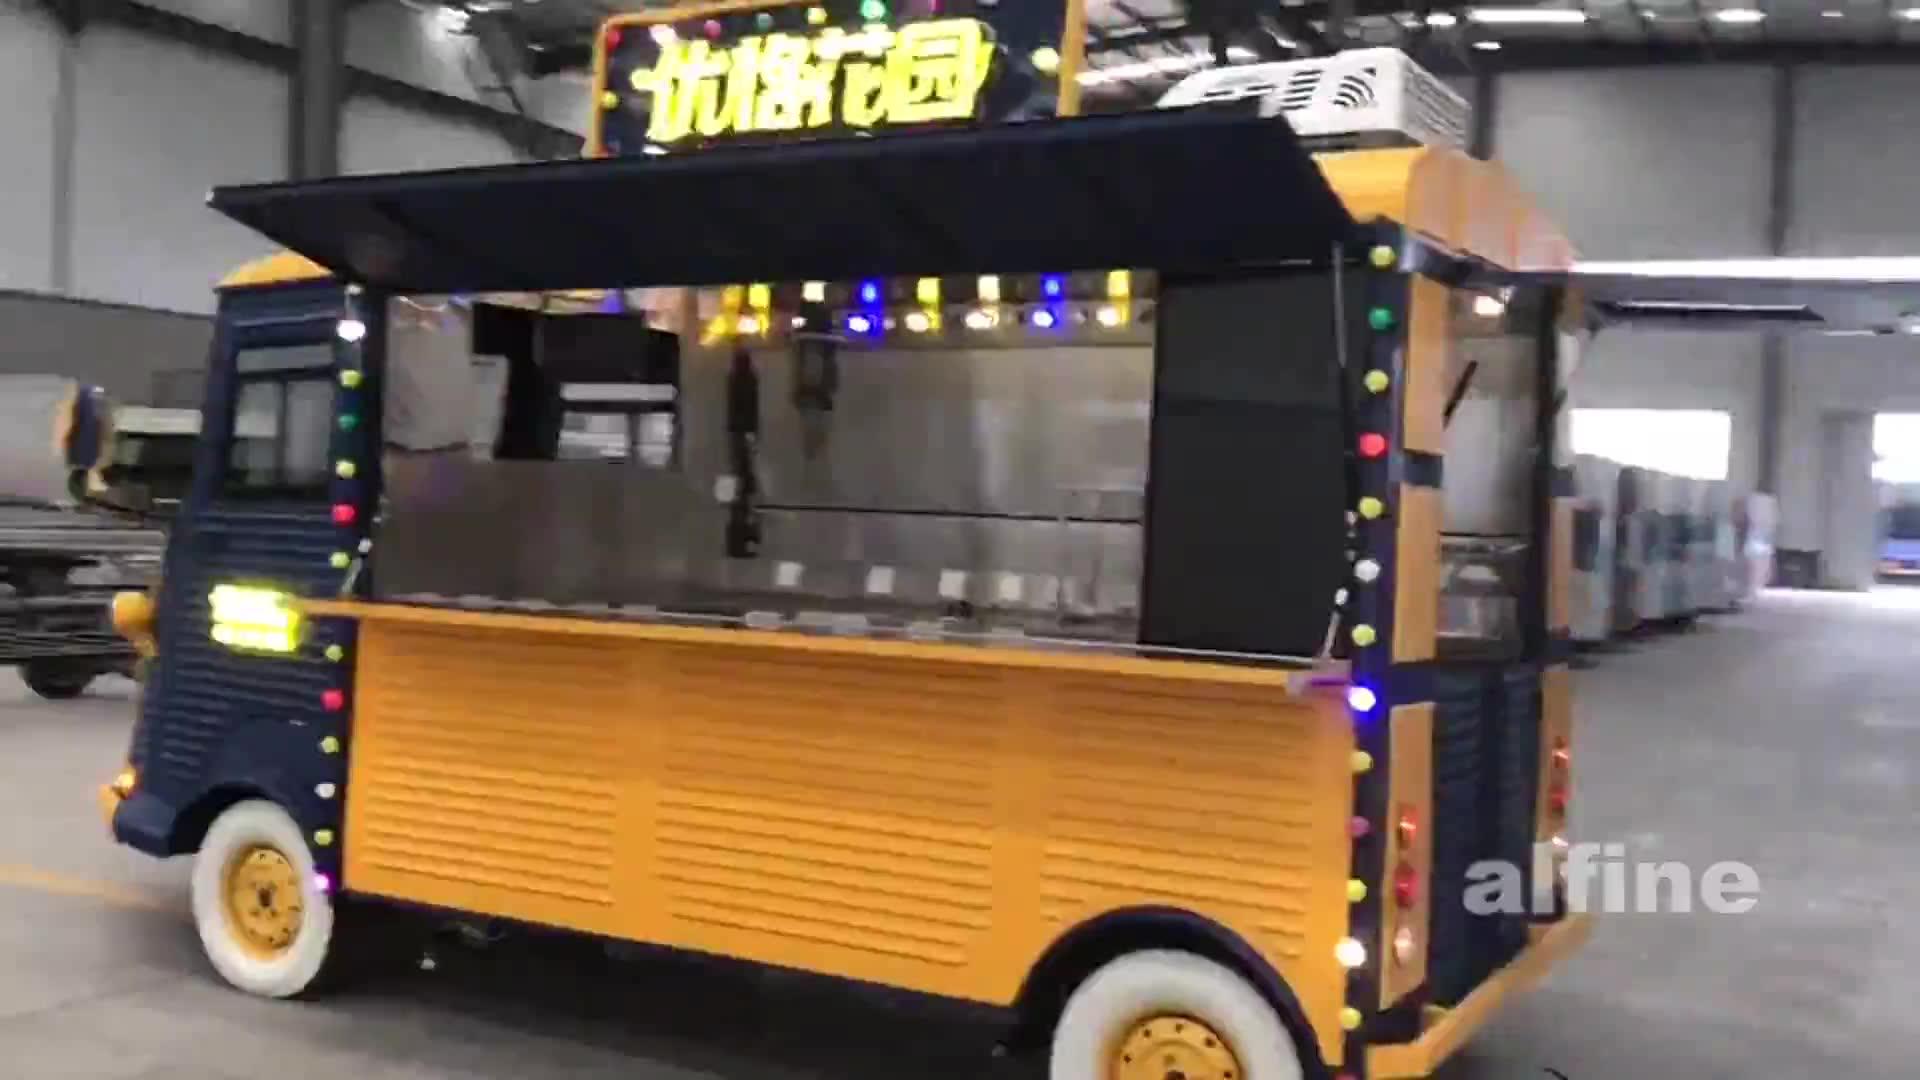 2019 BBQ mobile food van electric food truck